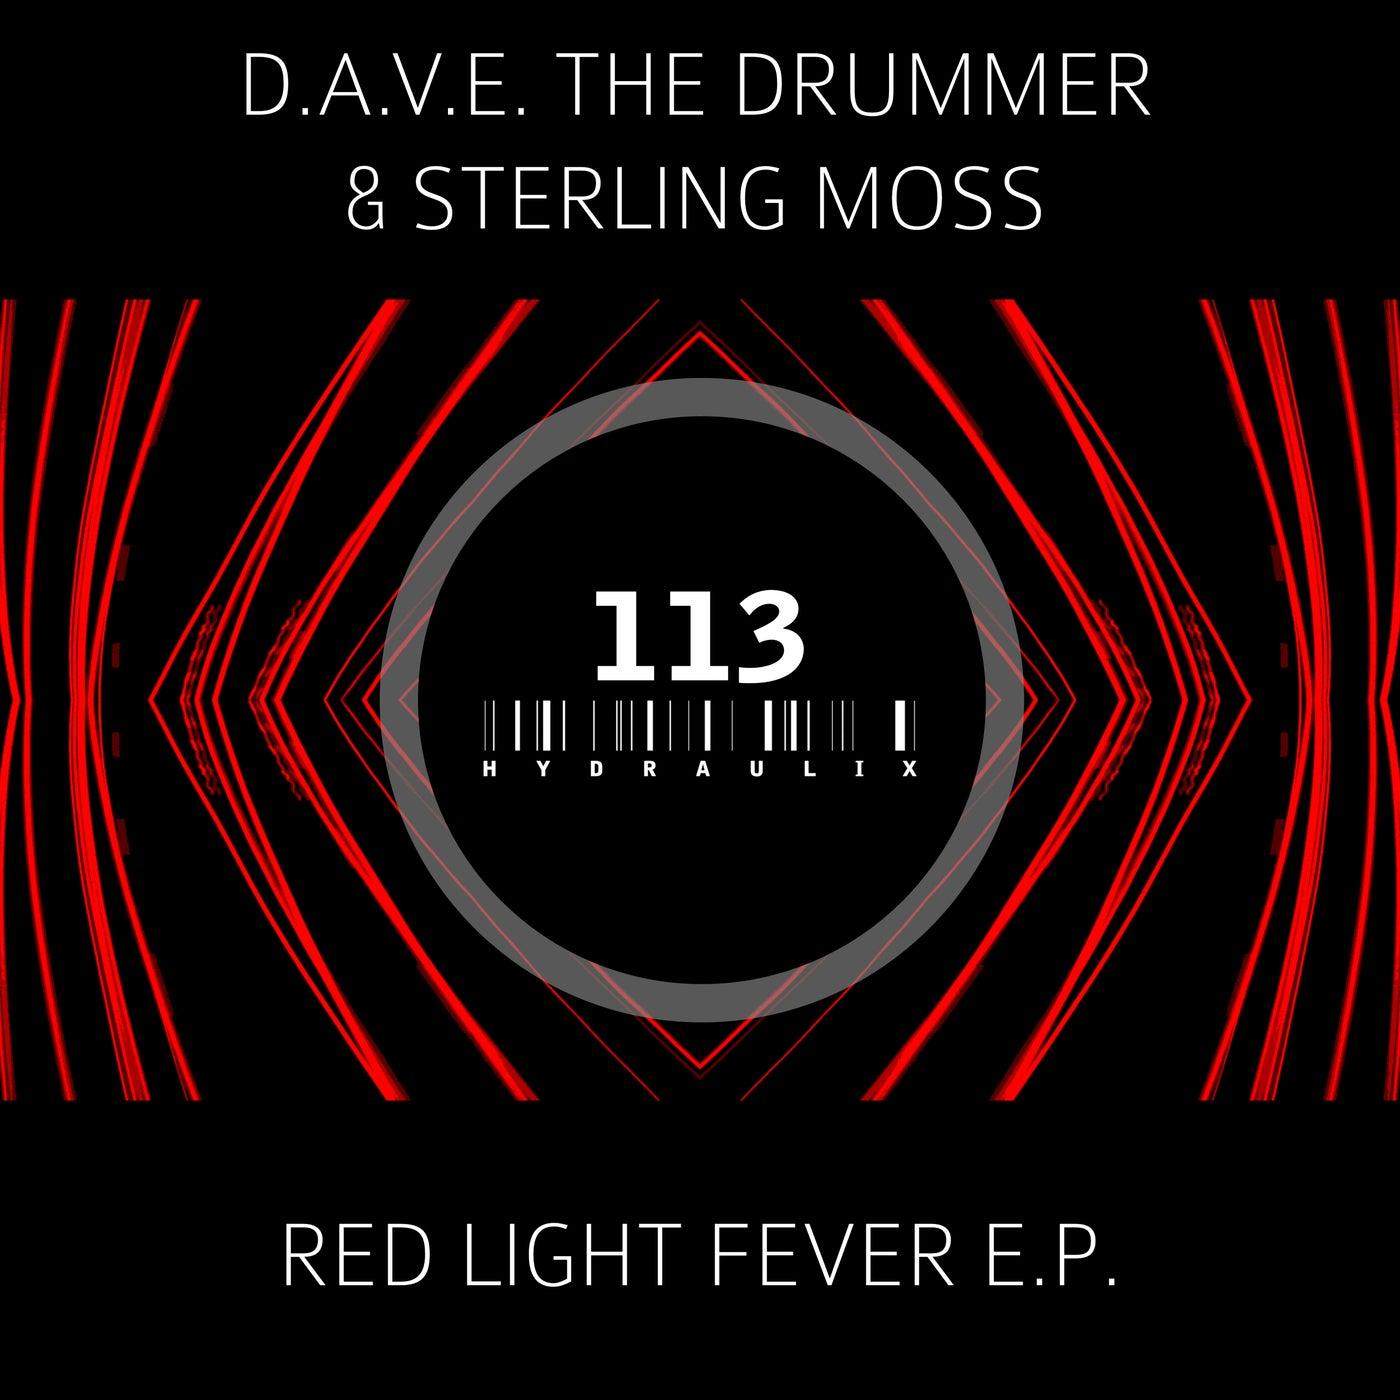 Red Light Fever (D.A.V.E. The Drummer Remix)